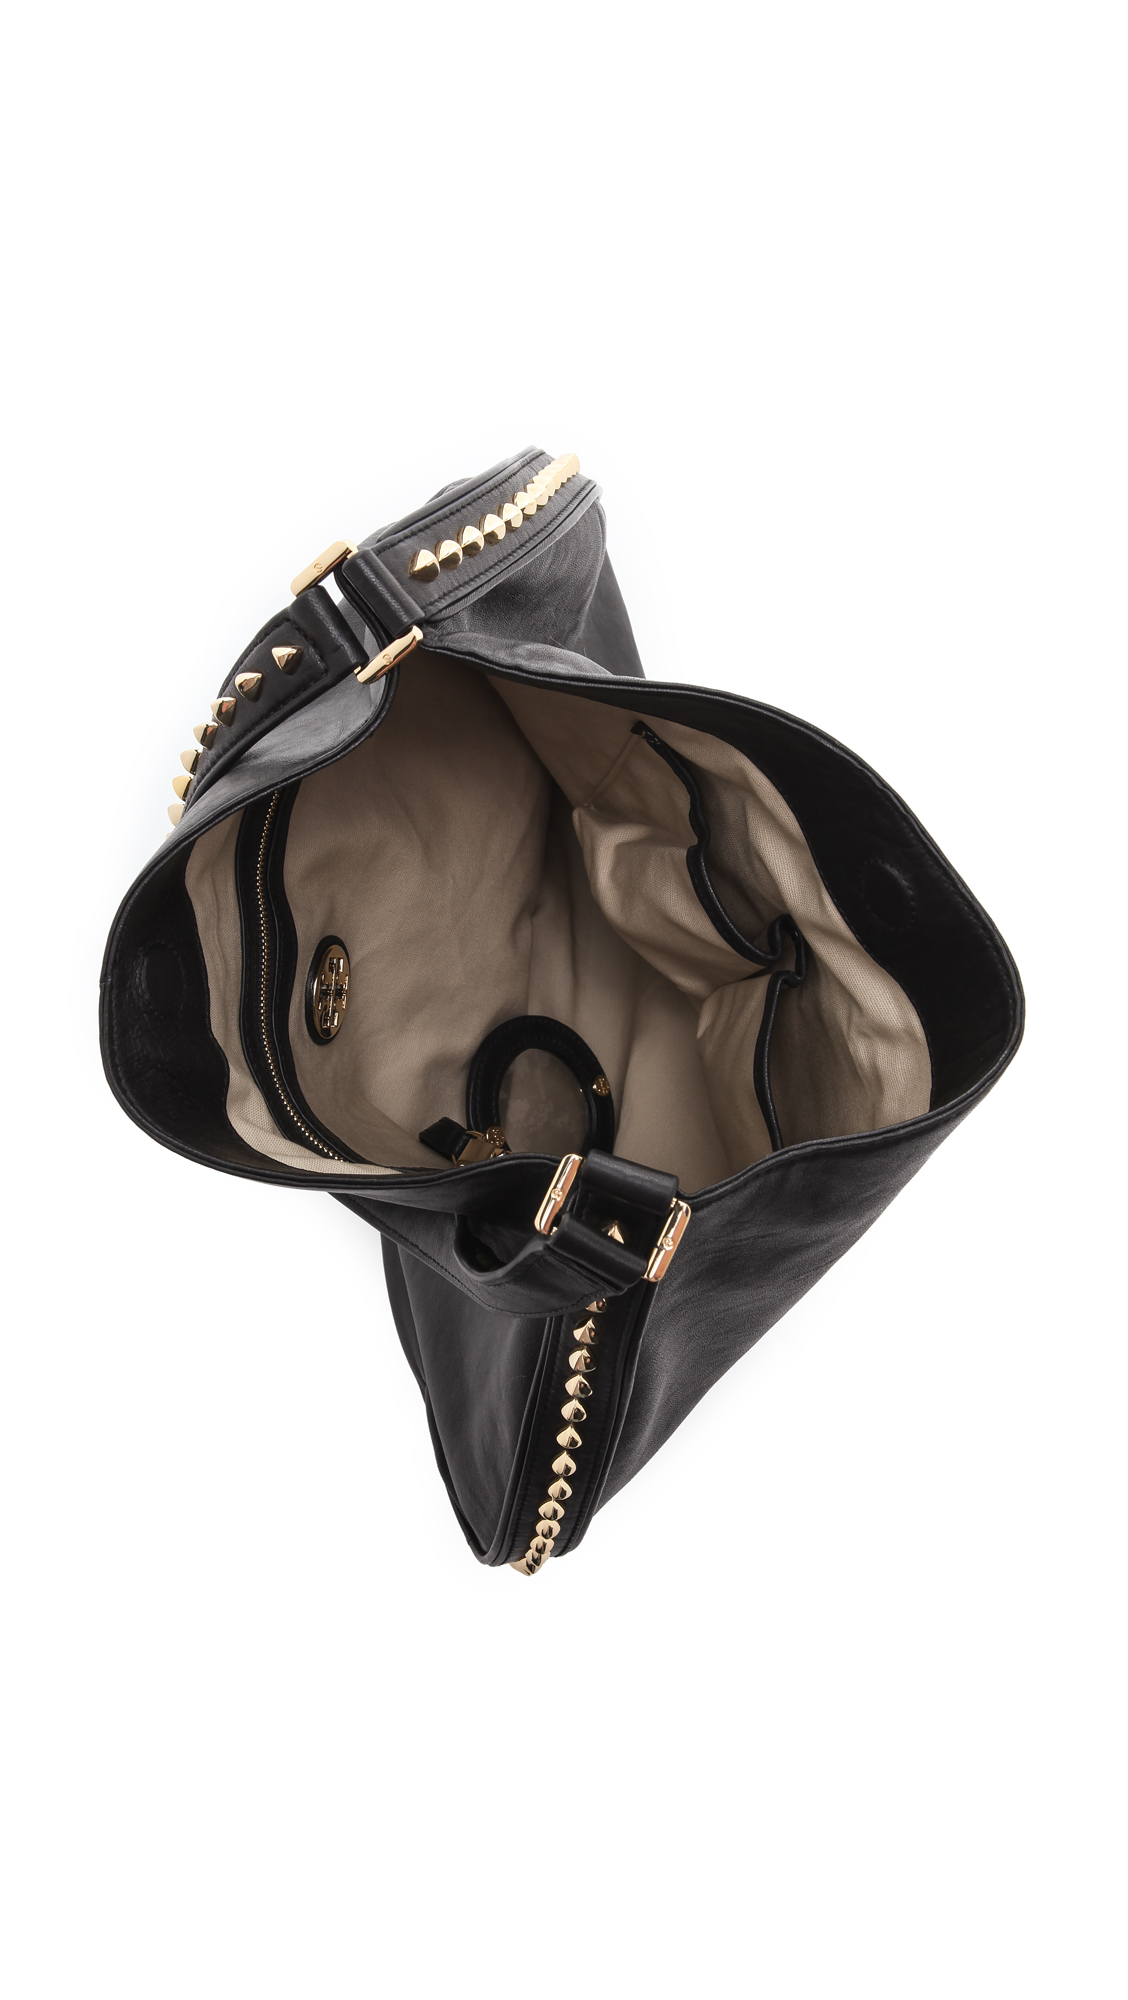 7e9fe4f11637 Lyst - Tory Burch Pyramid Studded Hobo Bag in Black